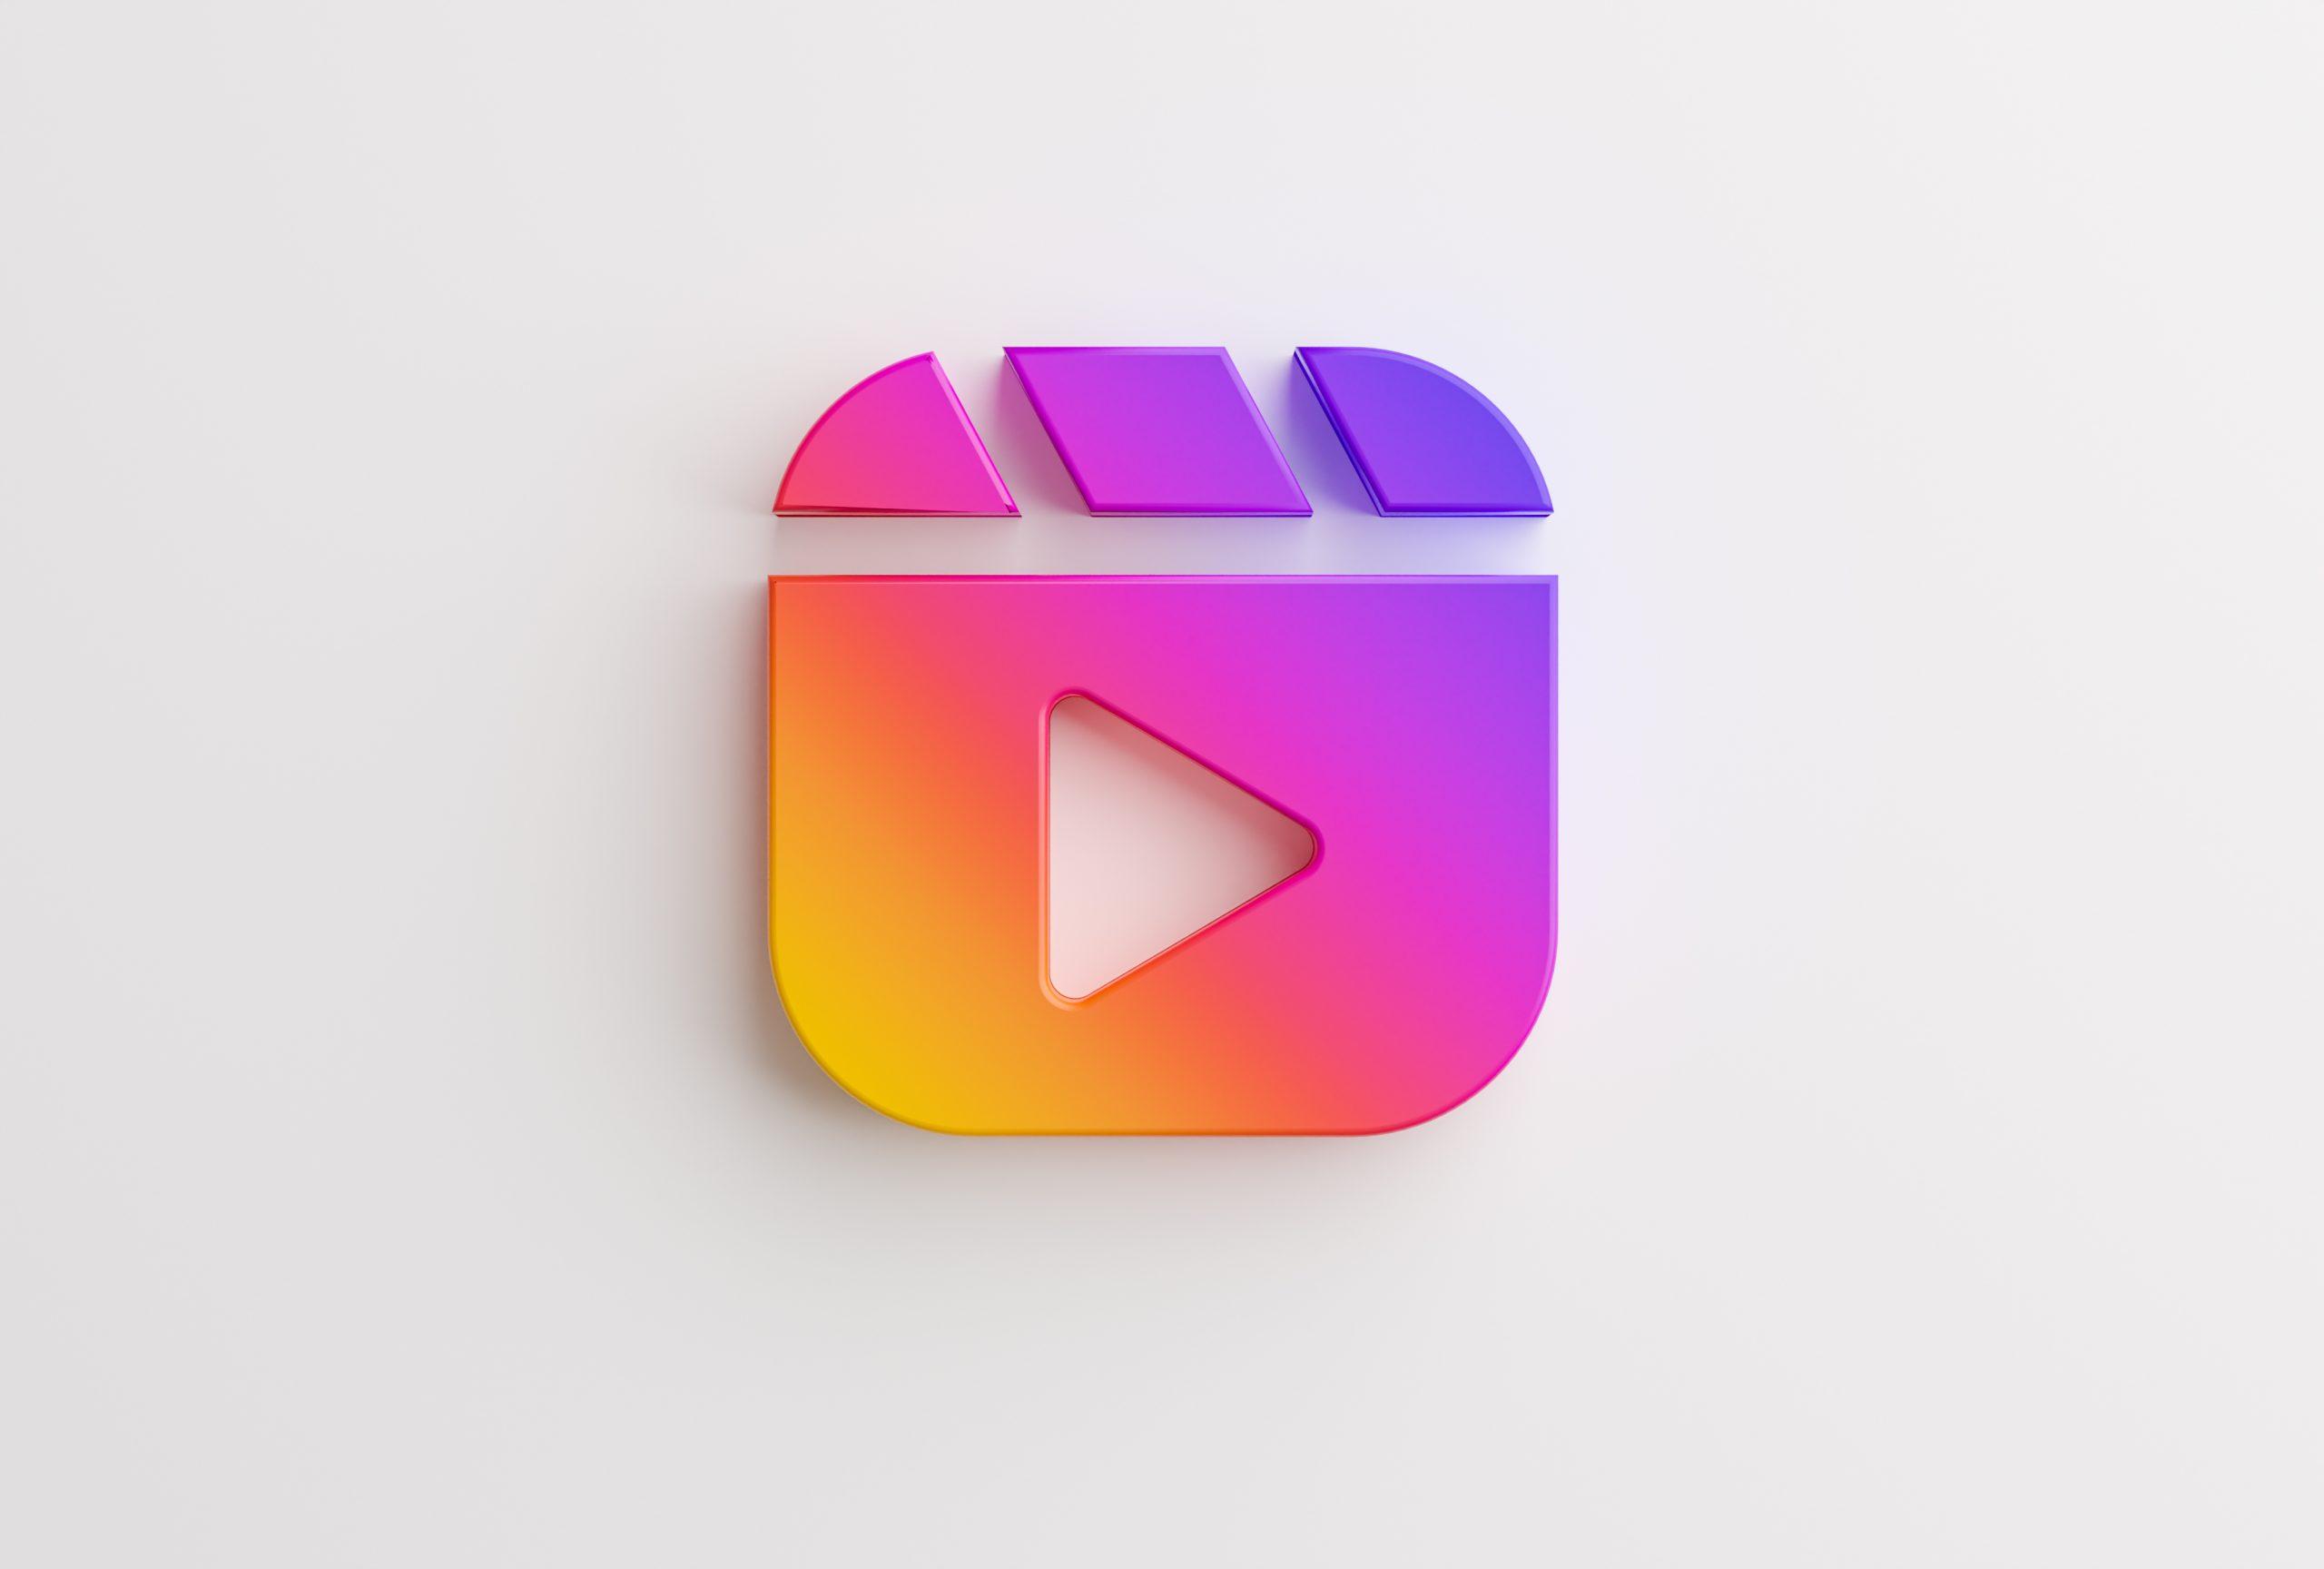 Why Instagram Reels is a gamechanger